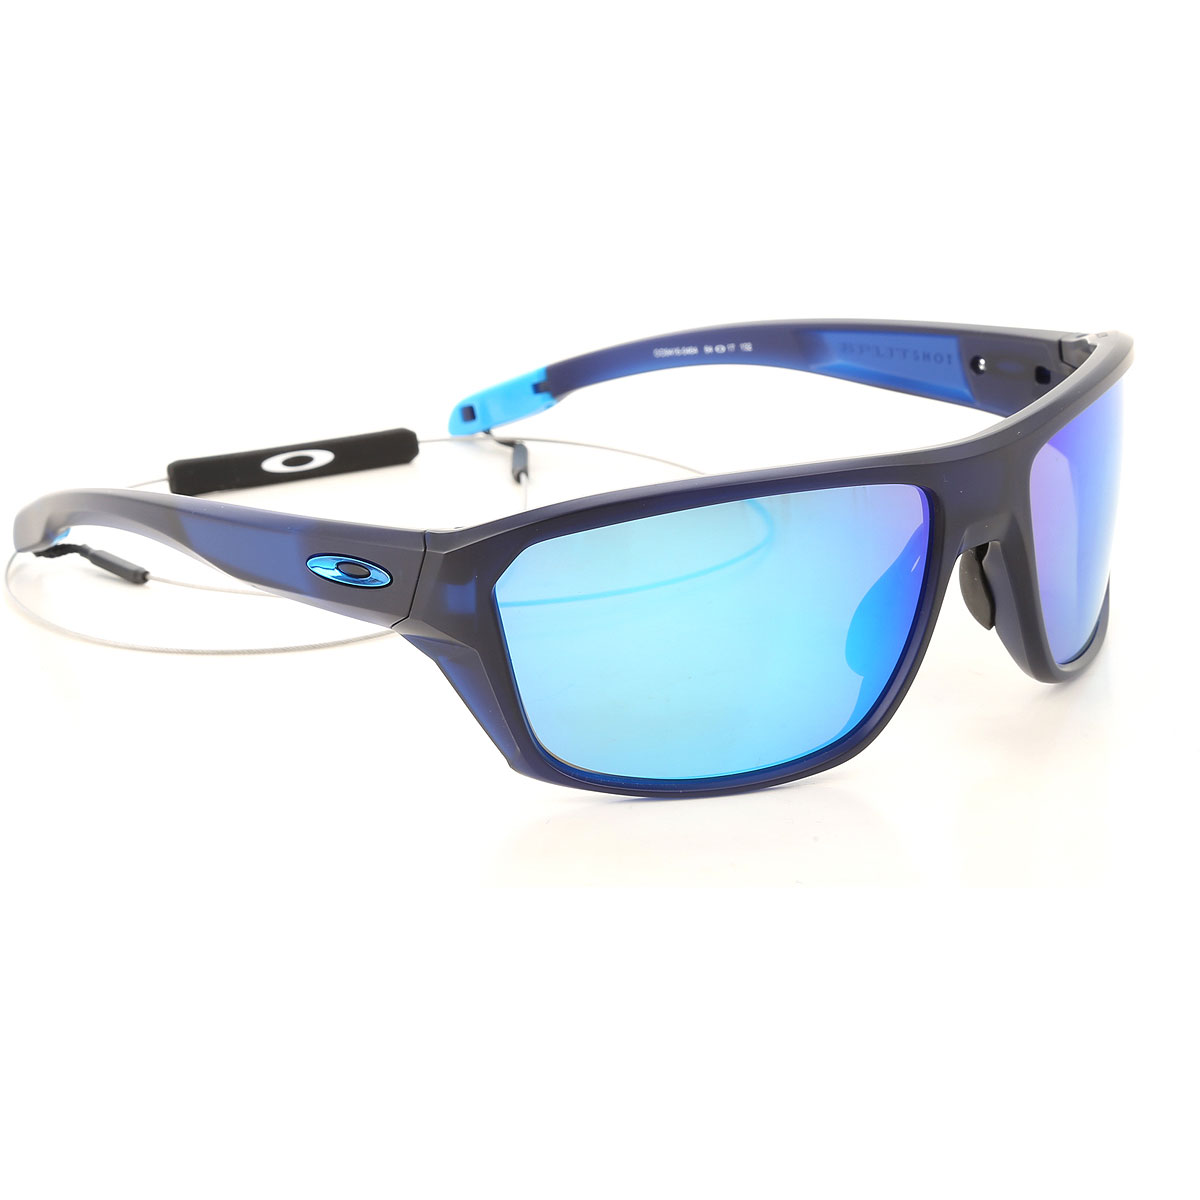 Oakley Sunglasses On Sale, Matte Traslucent Blue, 2019